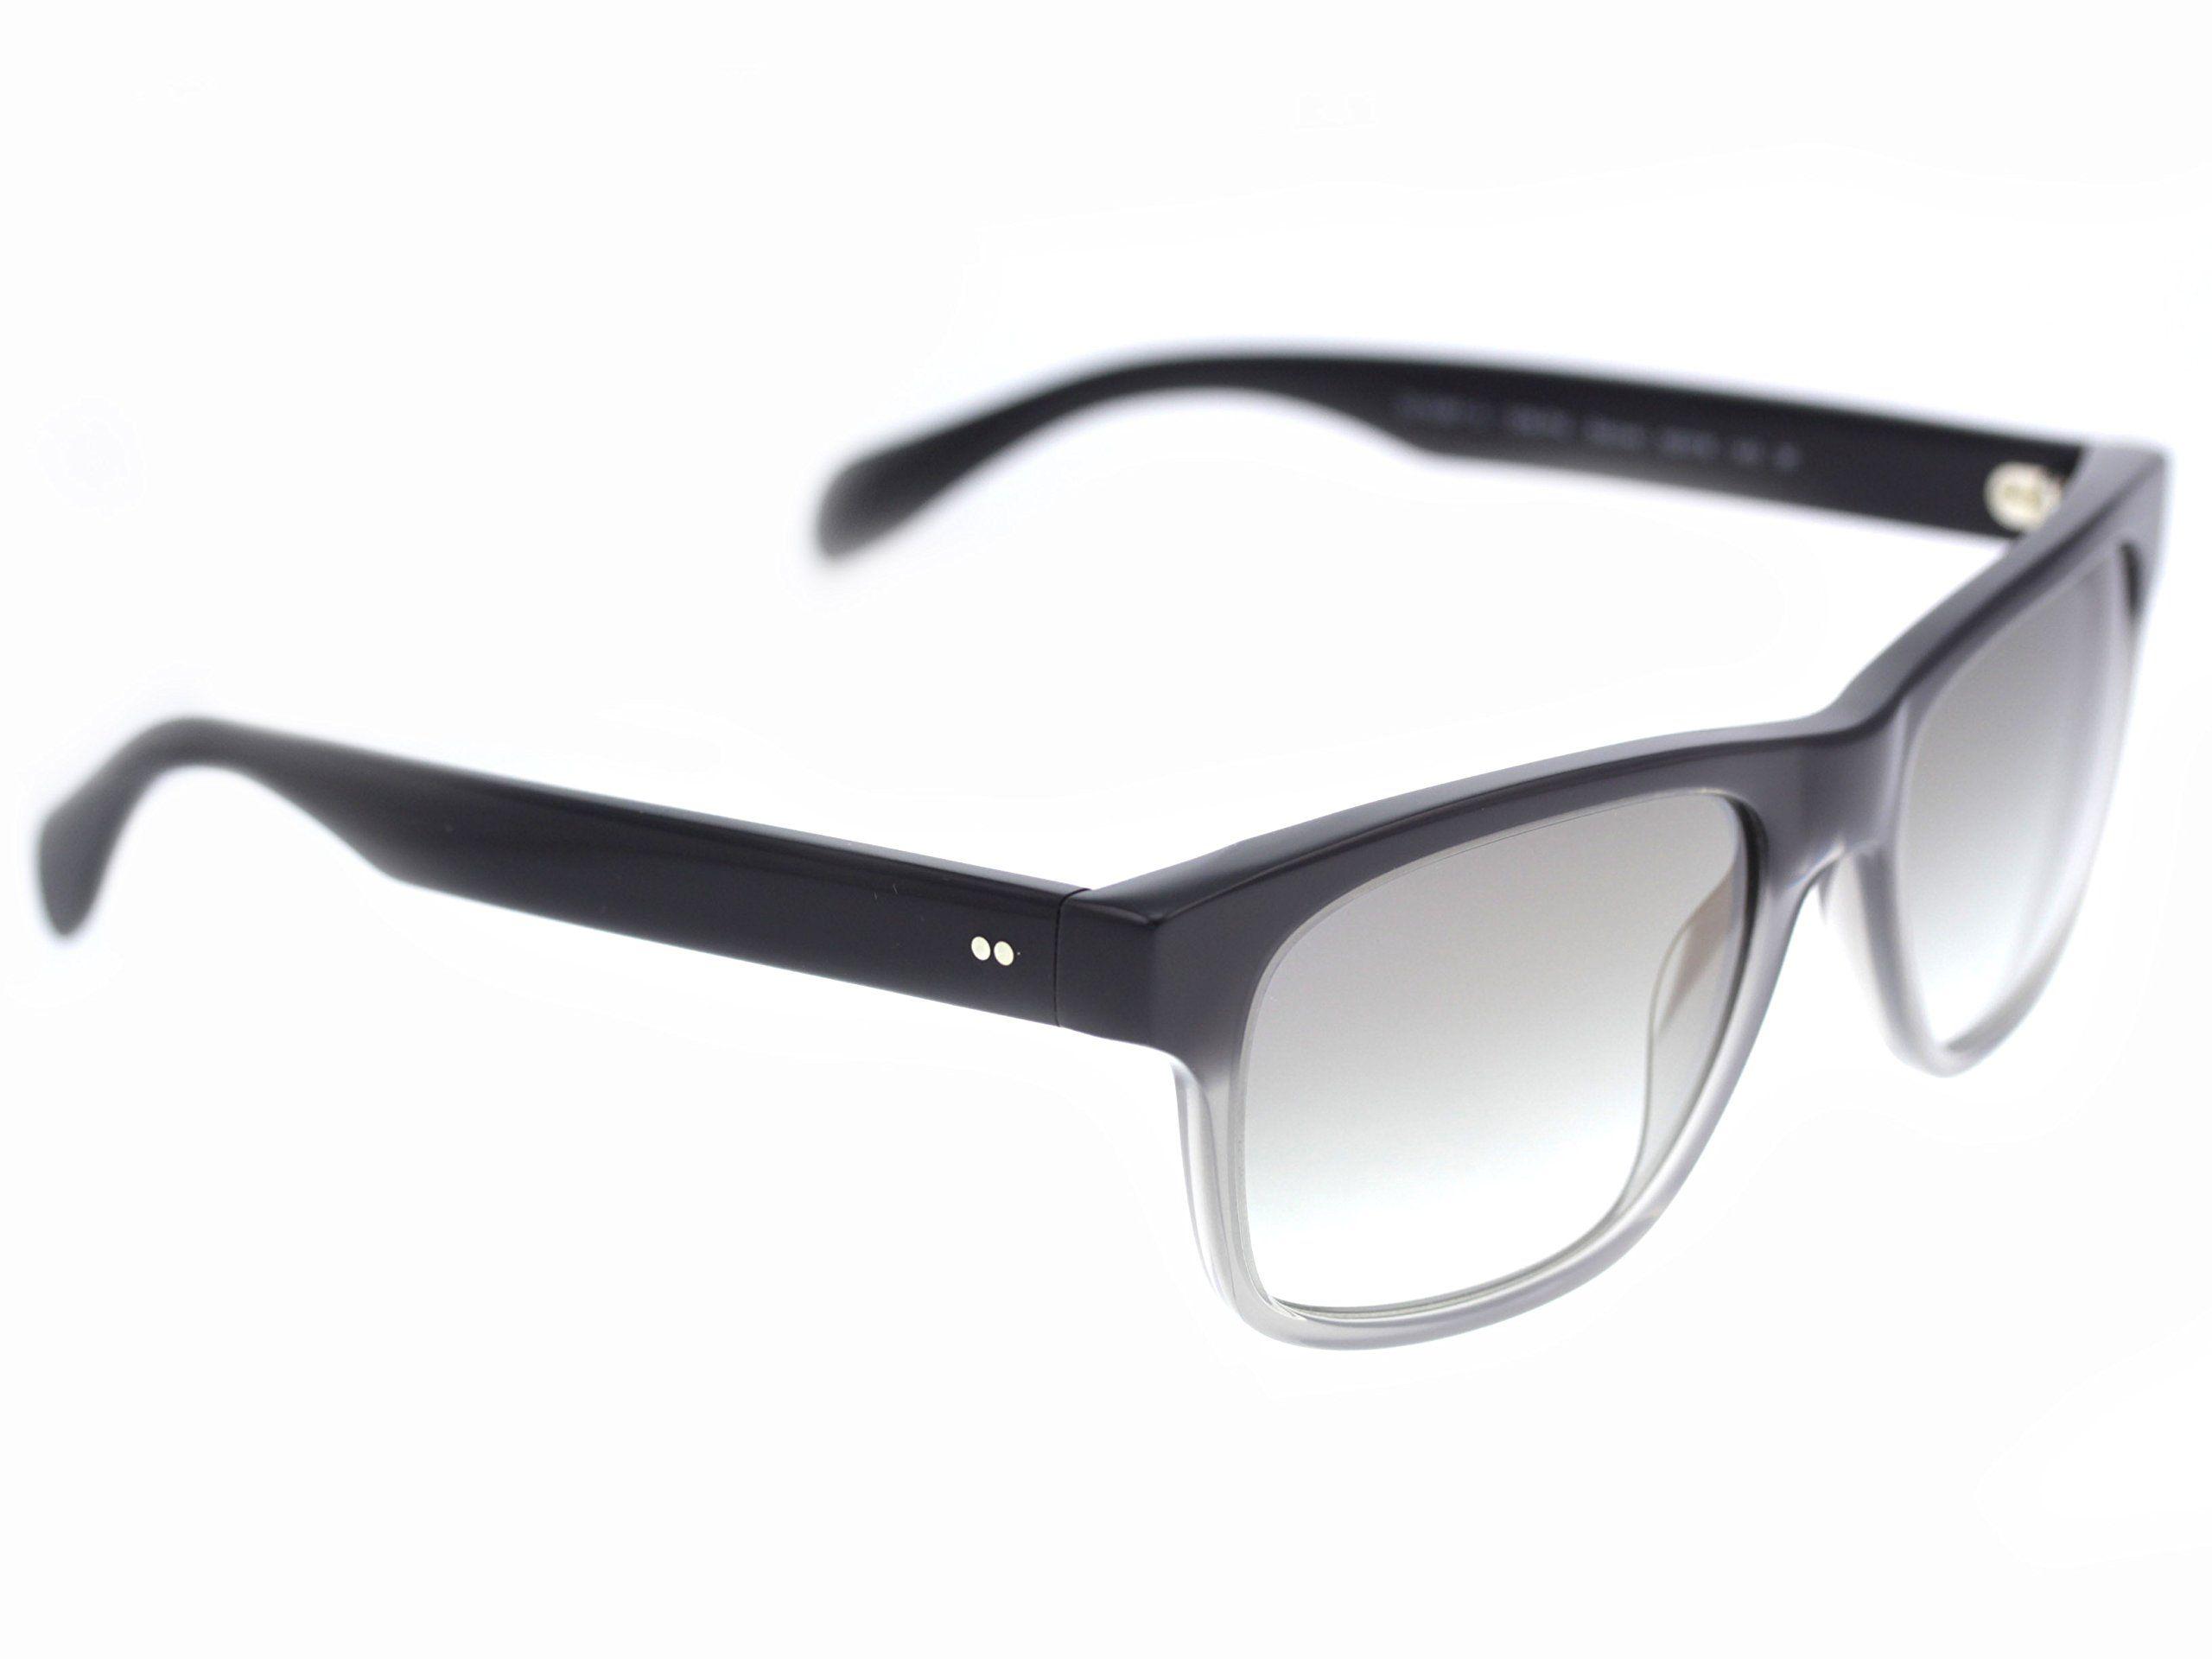 Peoples Sunglasses Gradient 5267 Grey Oliver 55 1336r4 Becket eCoxdB